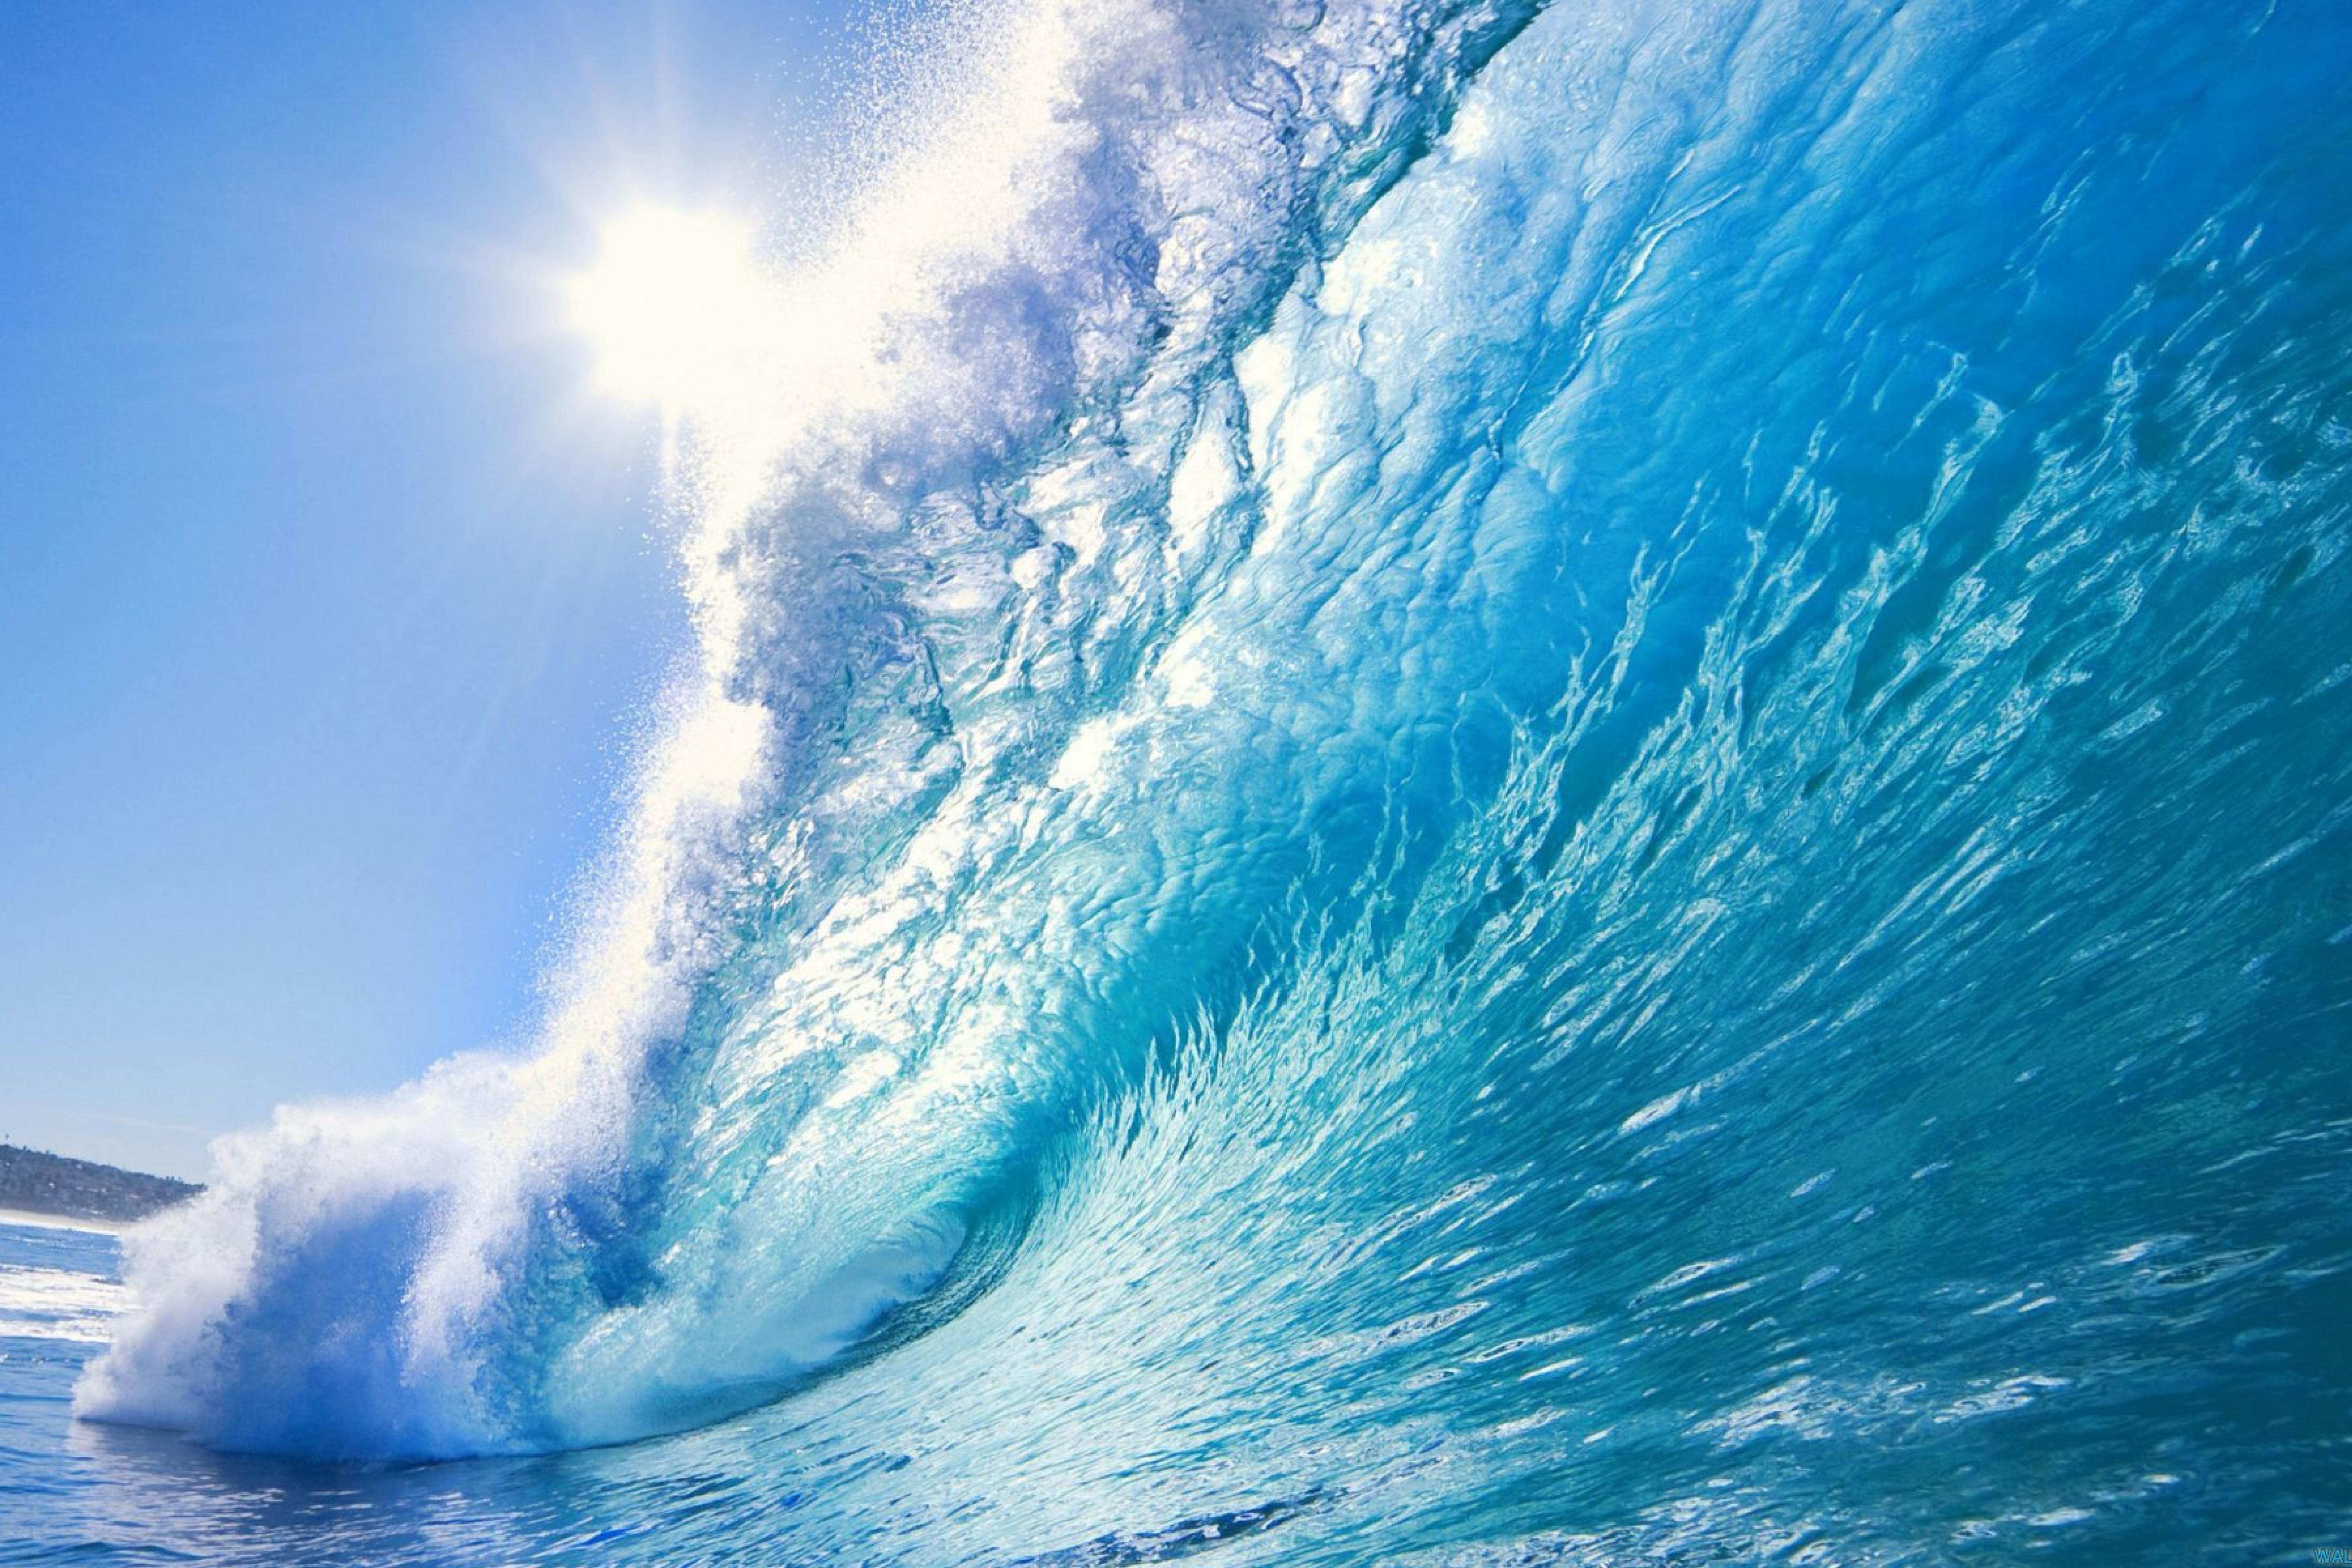 Море фото на рабочий стол 15